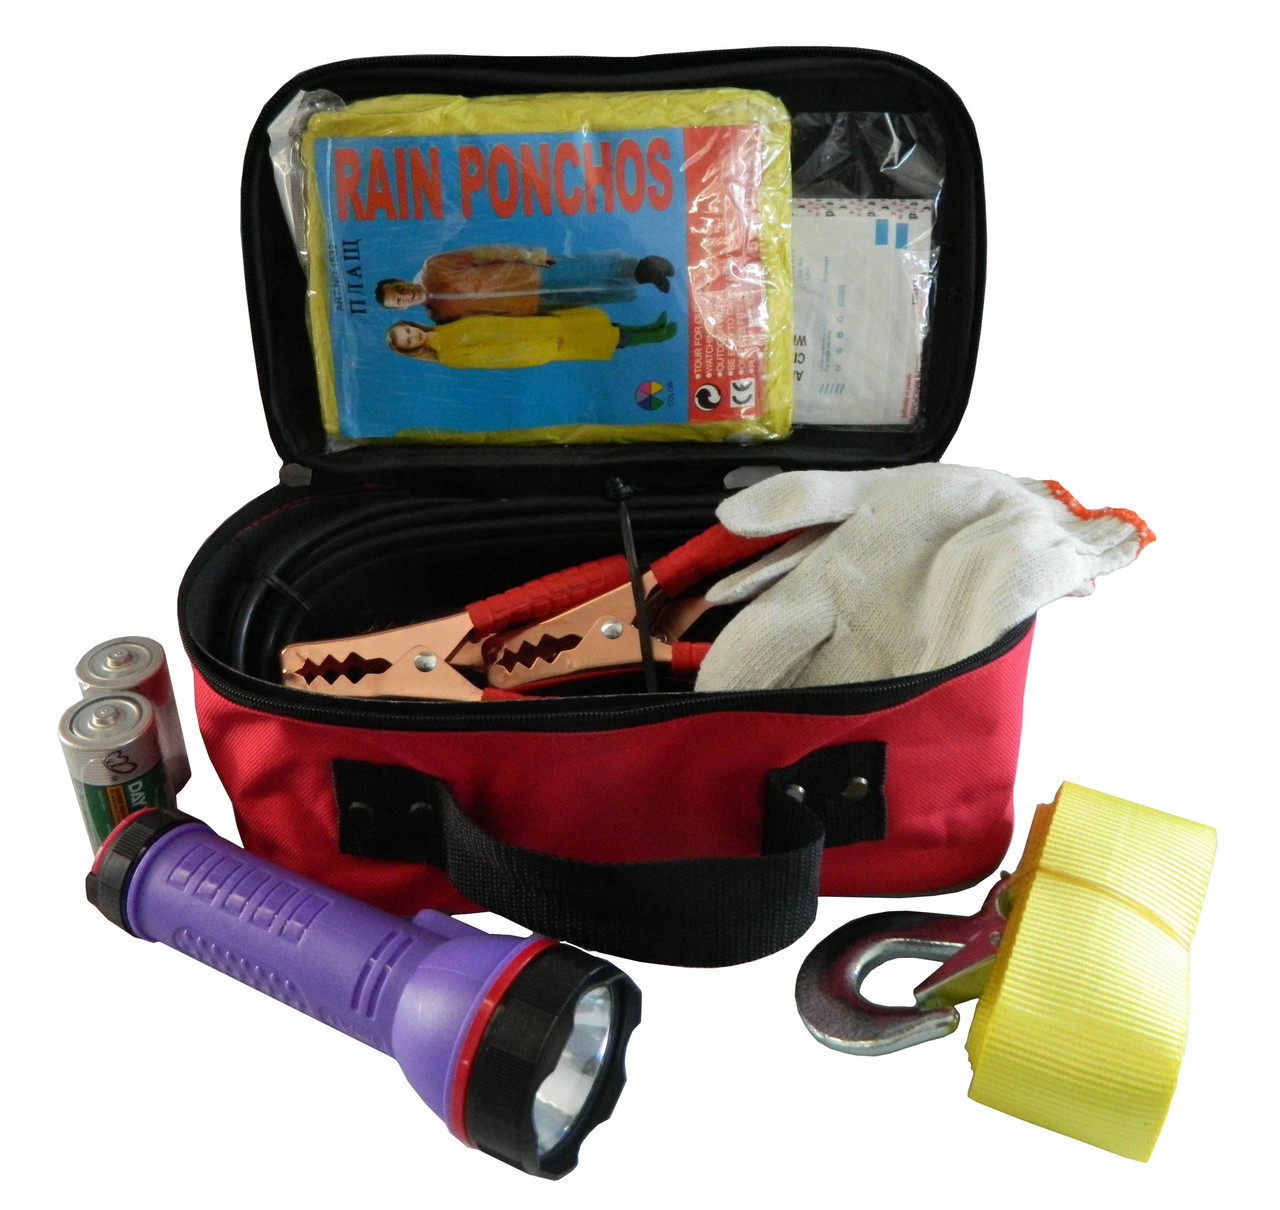 ESK31051 --- Auto Safety Kit